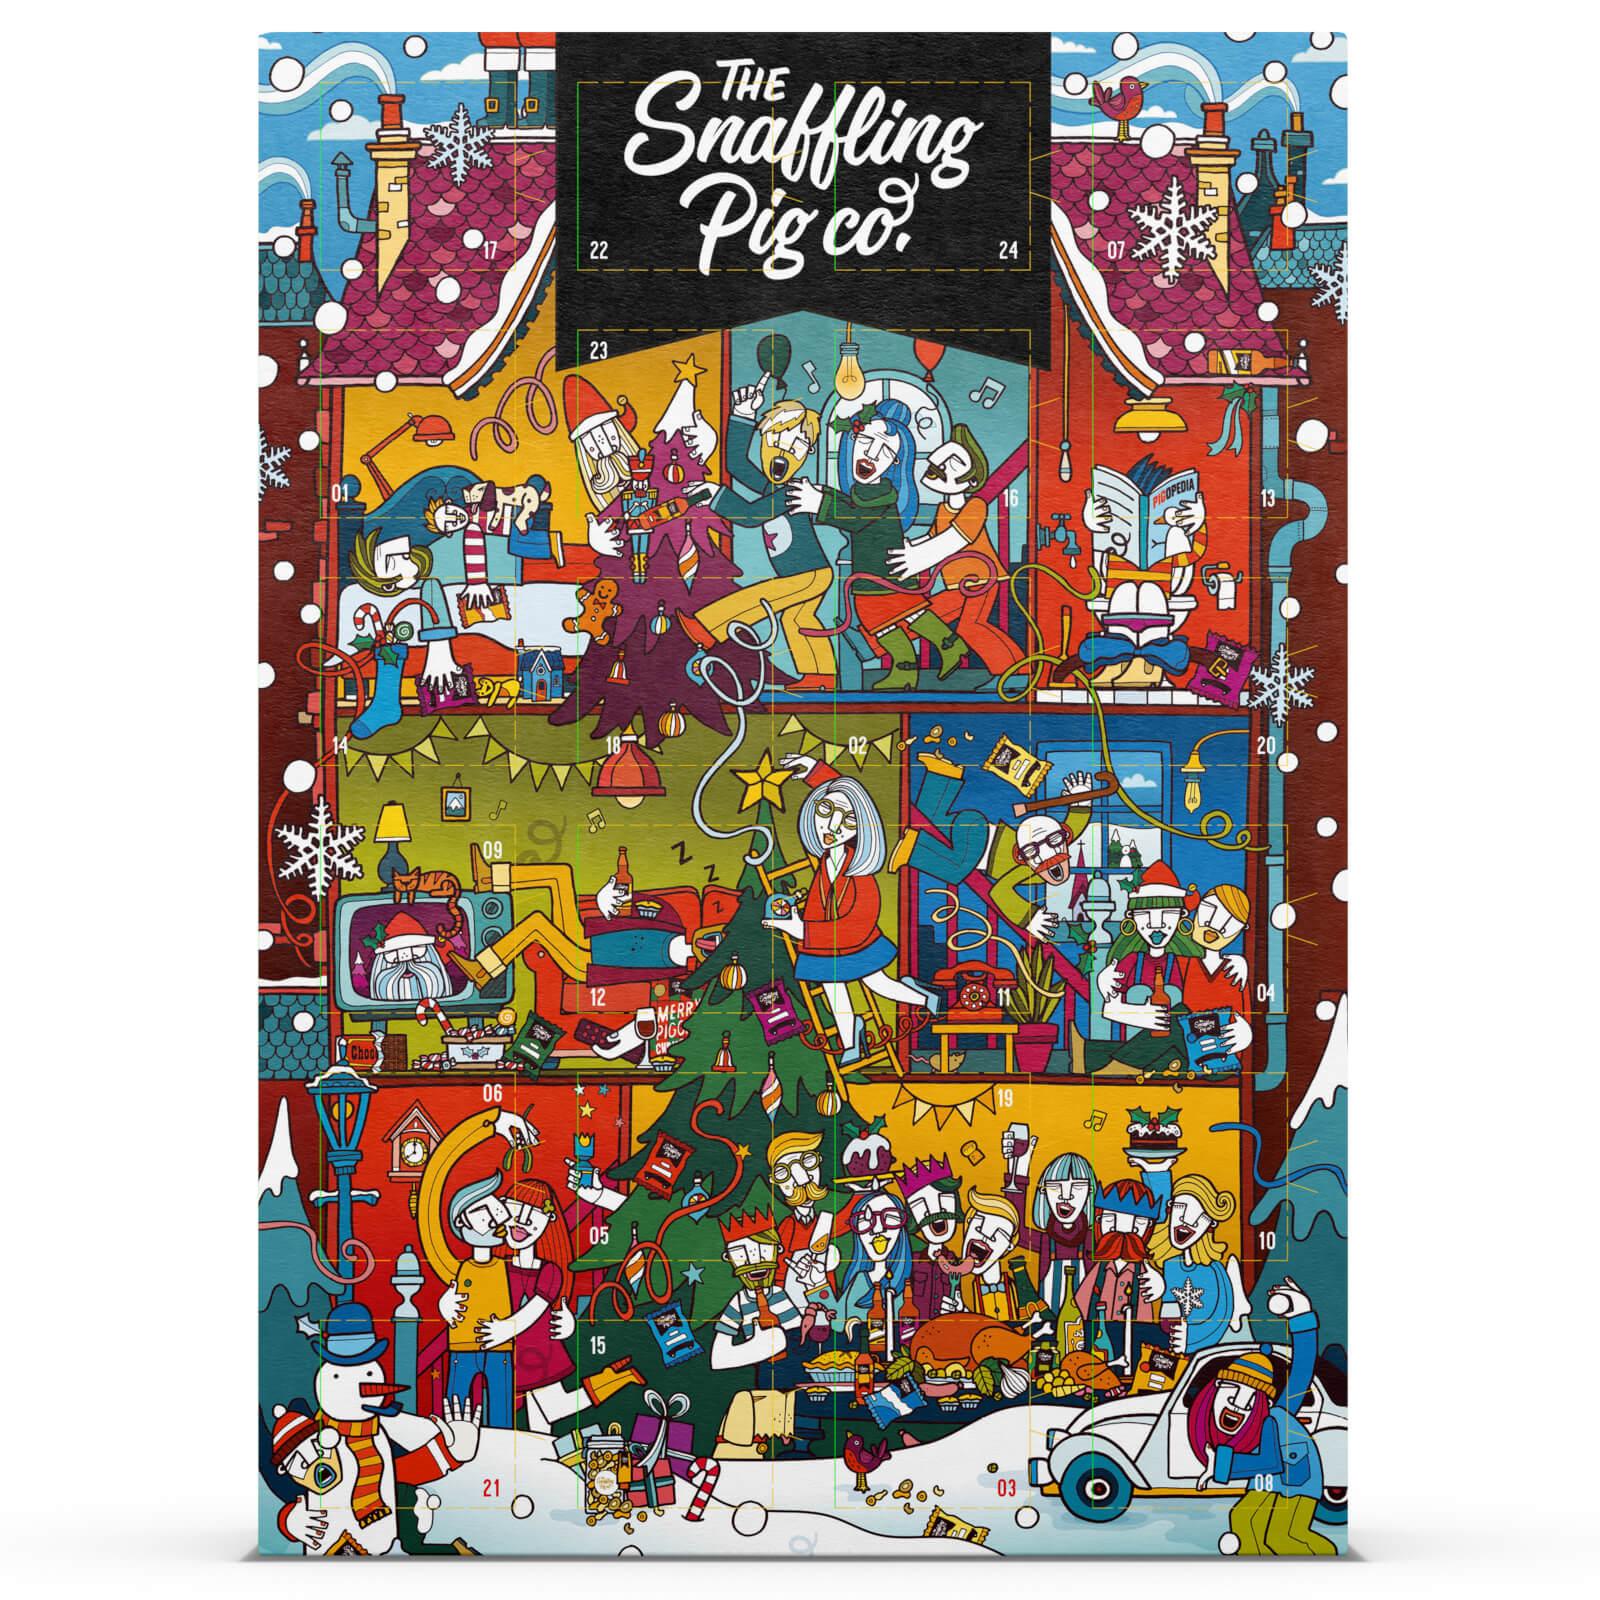 The Snaffling Pig Pork Crackling Advent Calendar £12.99 Each or For £22.00 @ I Want One of Those